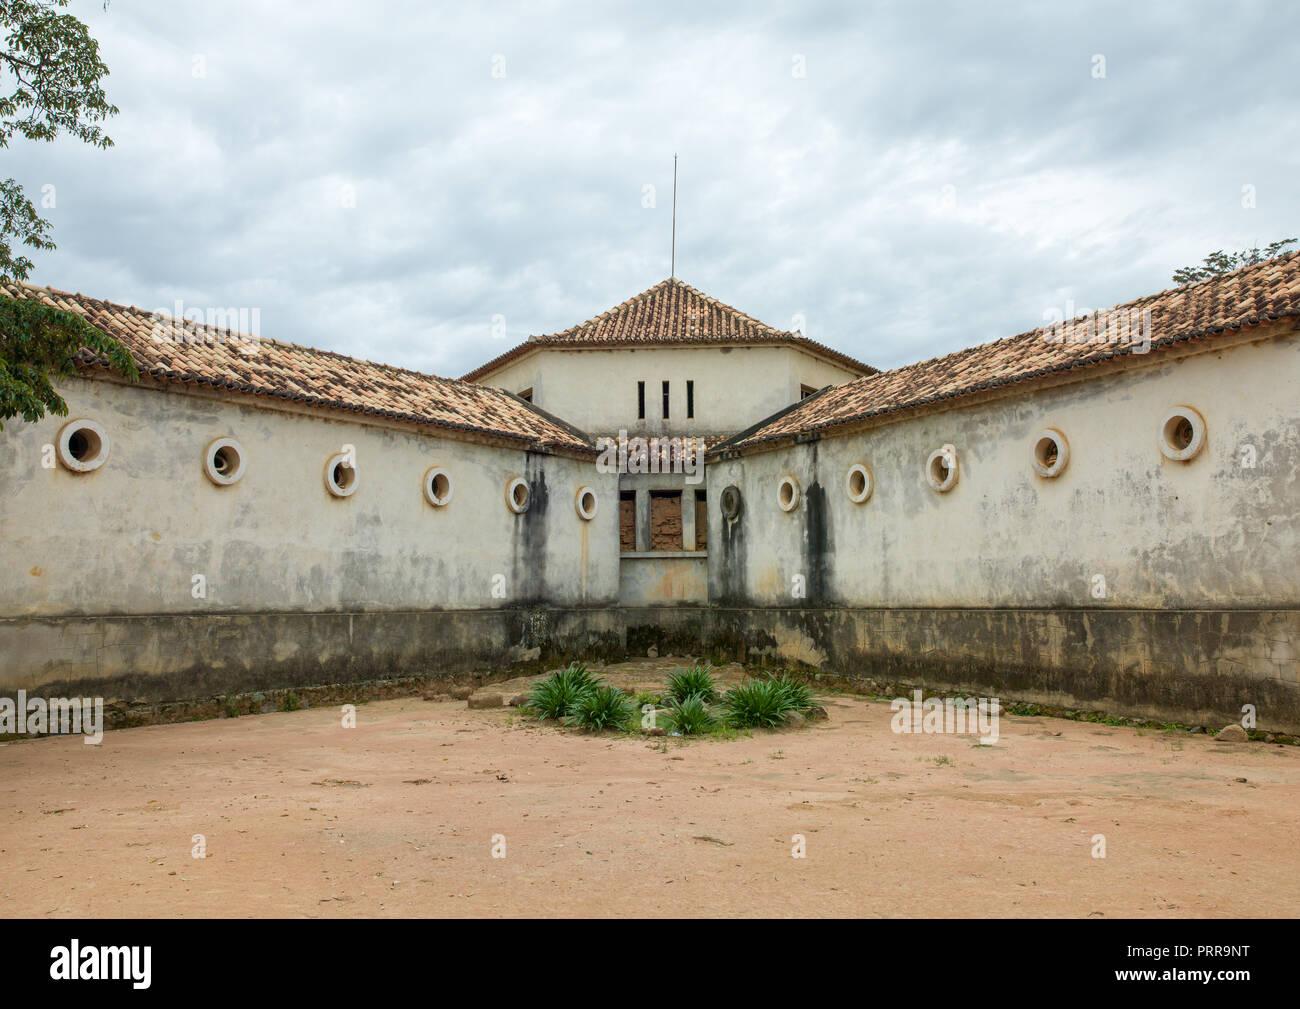 Old portuguese colonial building, Huila Province, Caconda, Angola Stock Photo